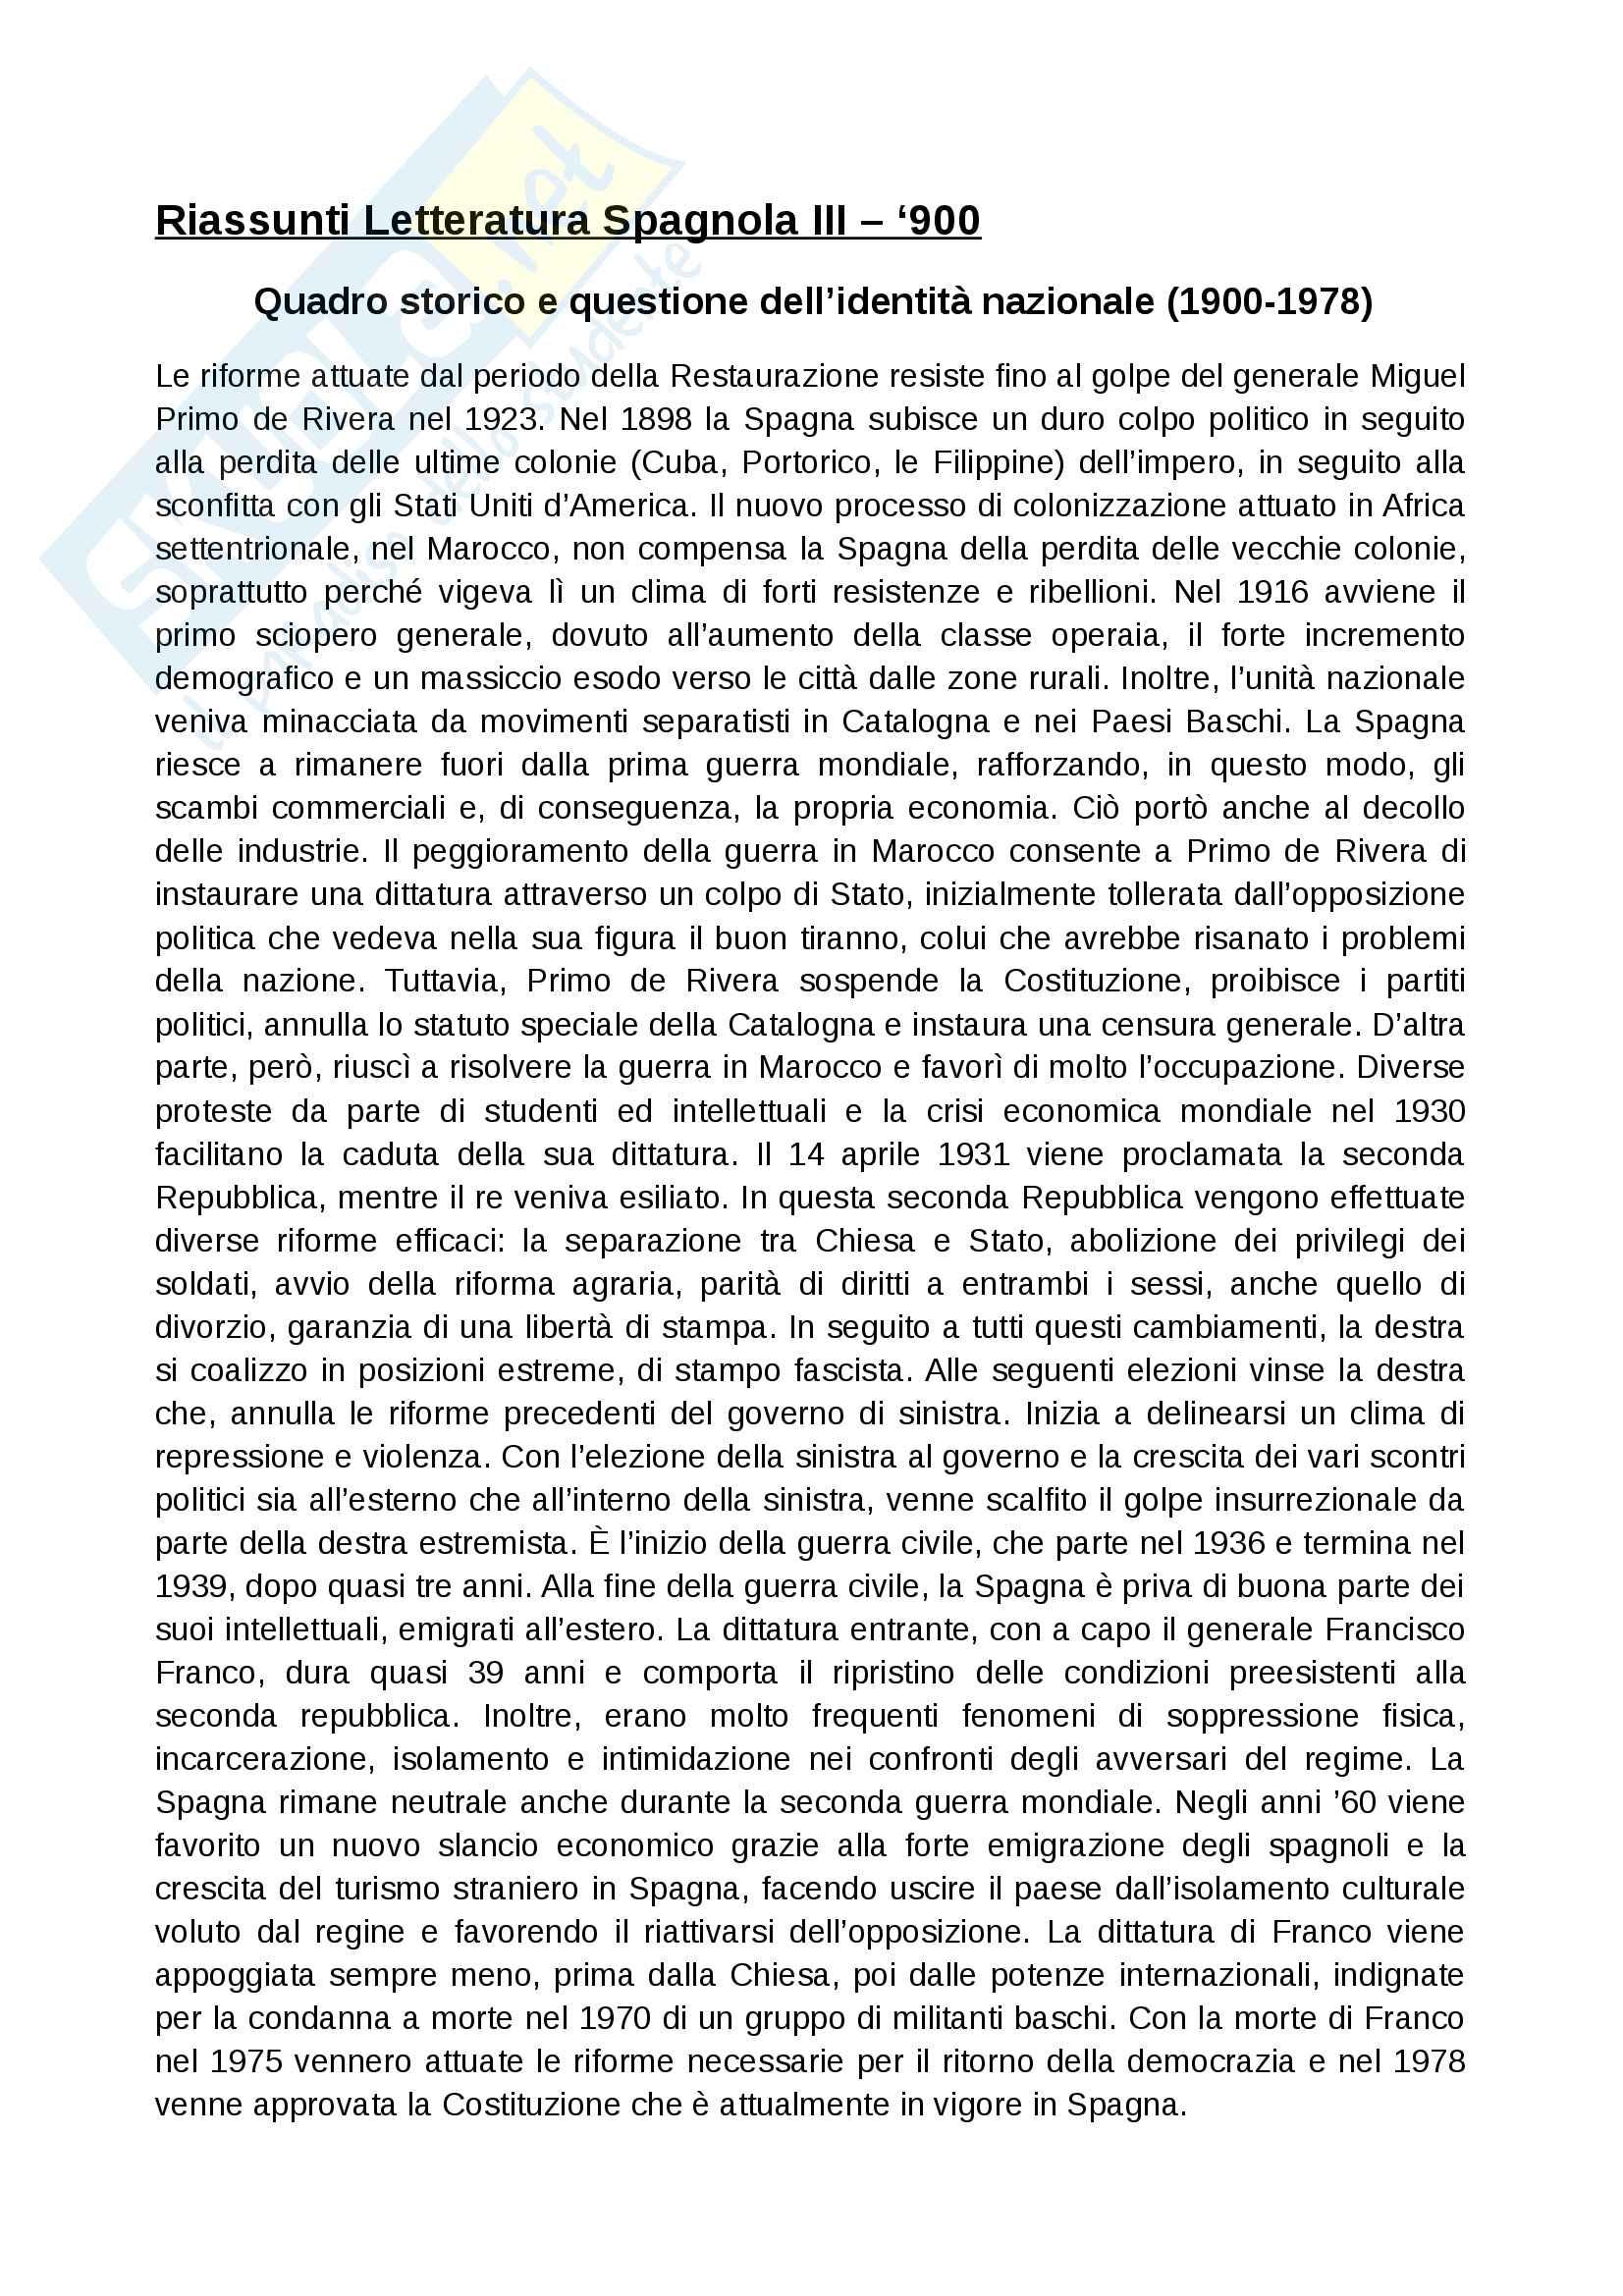 Contesto storico 900 spagnolo